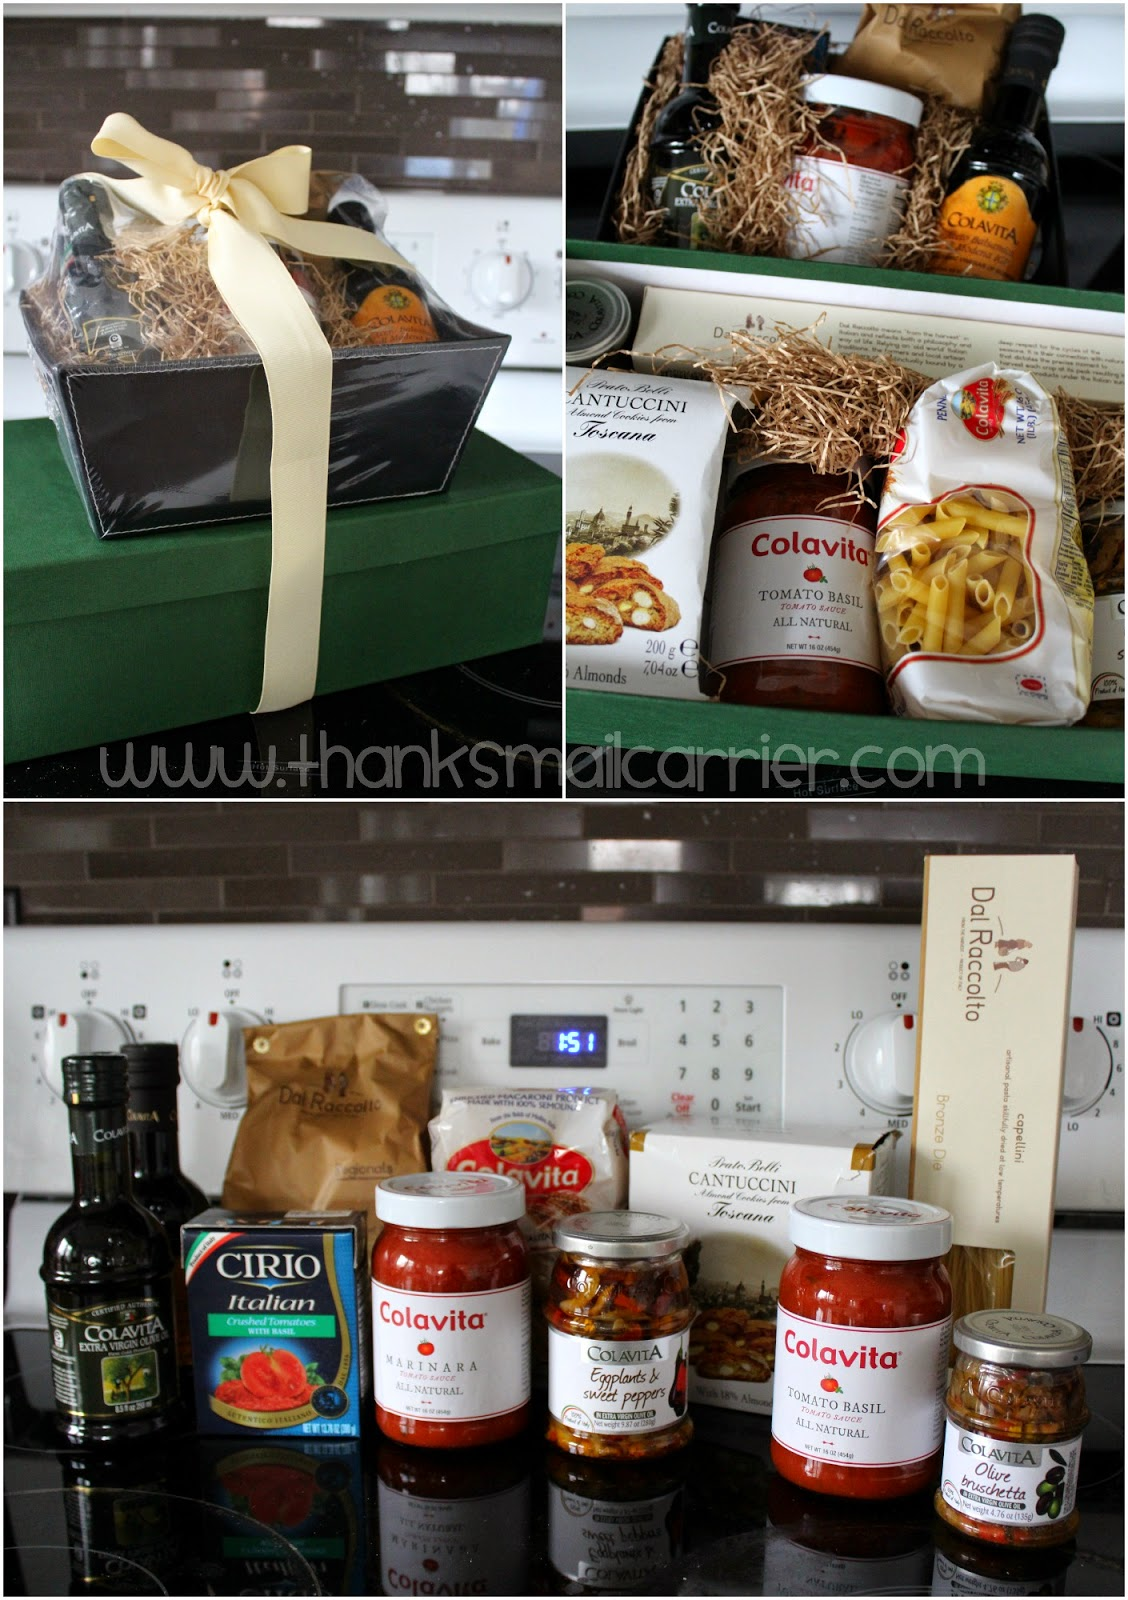 Colavita pasta products